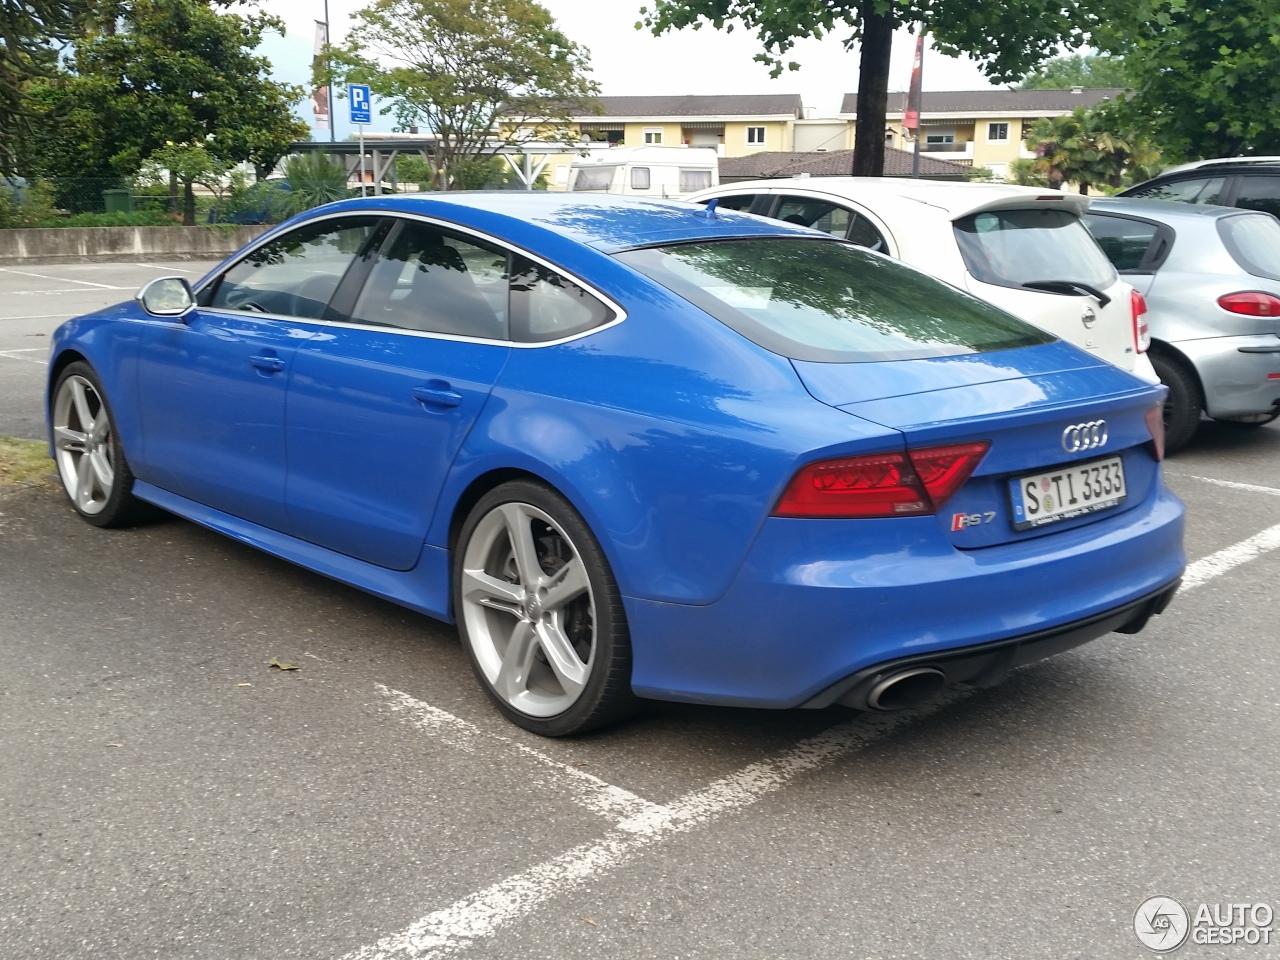 Audi RS7 Sportback - 2 februari 2016 - Autogespot